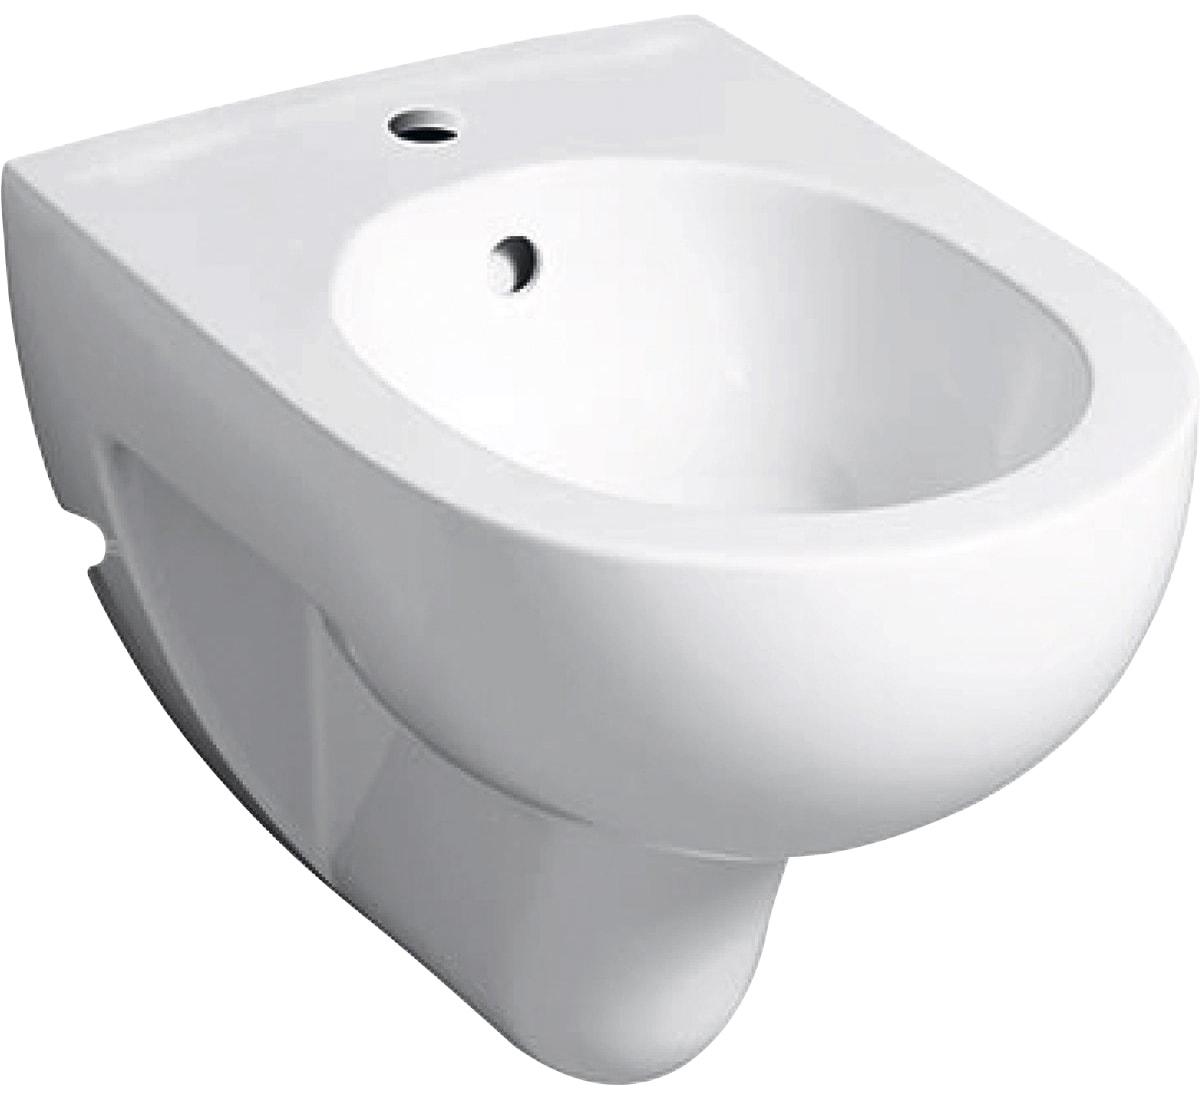 GEBERIT Bidet Renova Nr. 1, mit Überlauf, KeraTect weiß Bidets Bad Sanitär